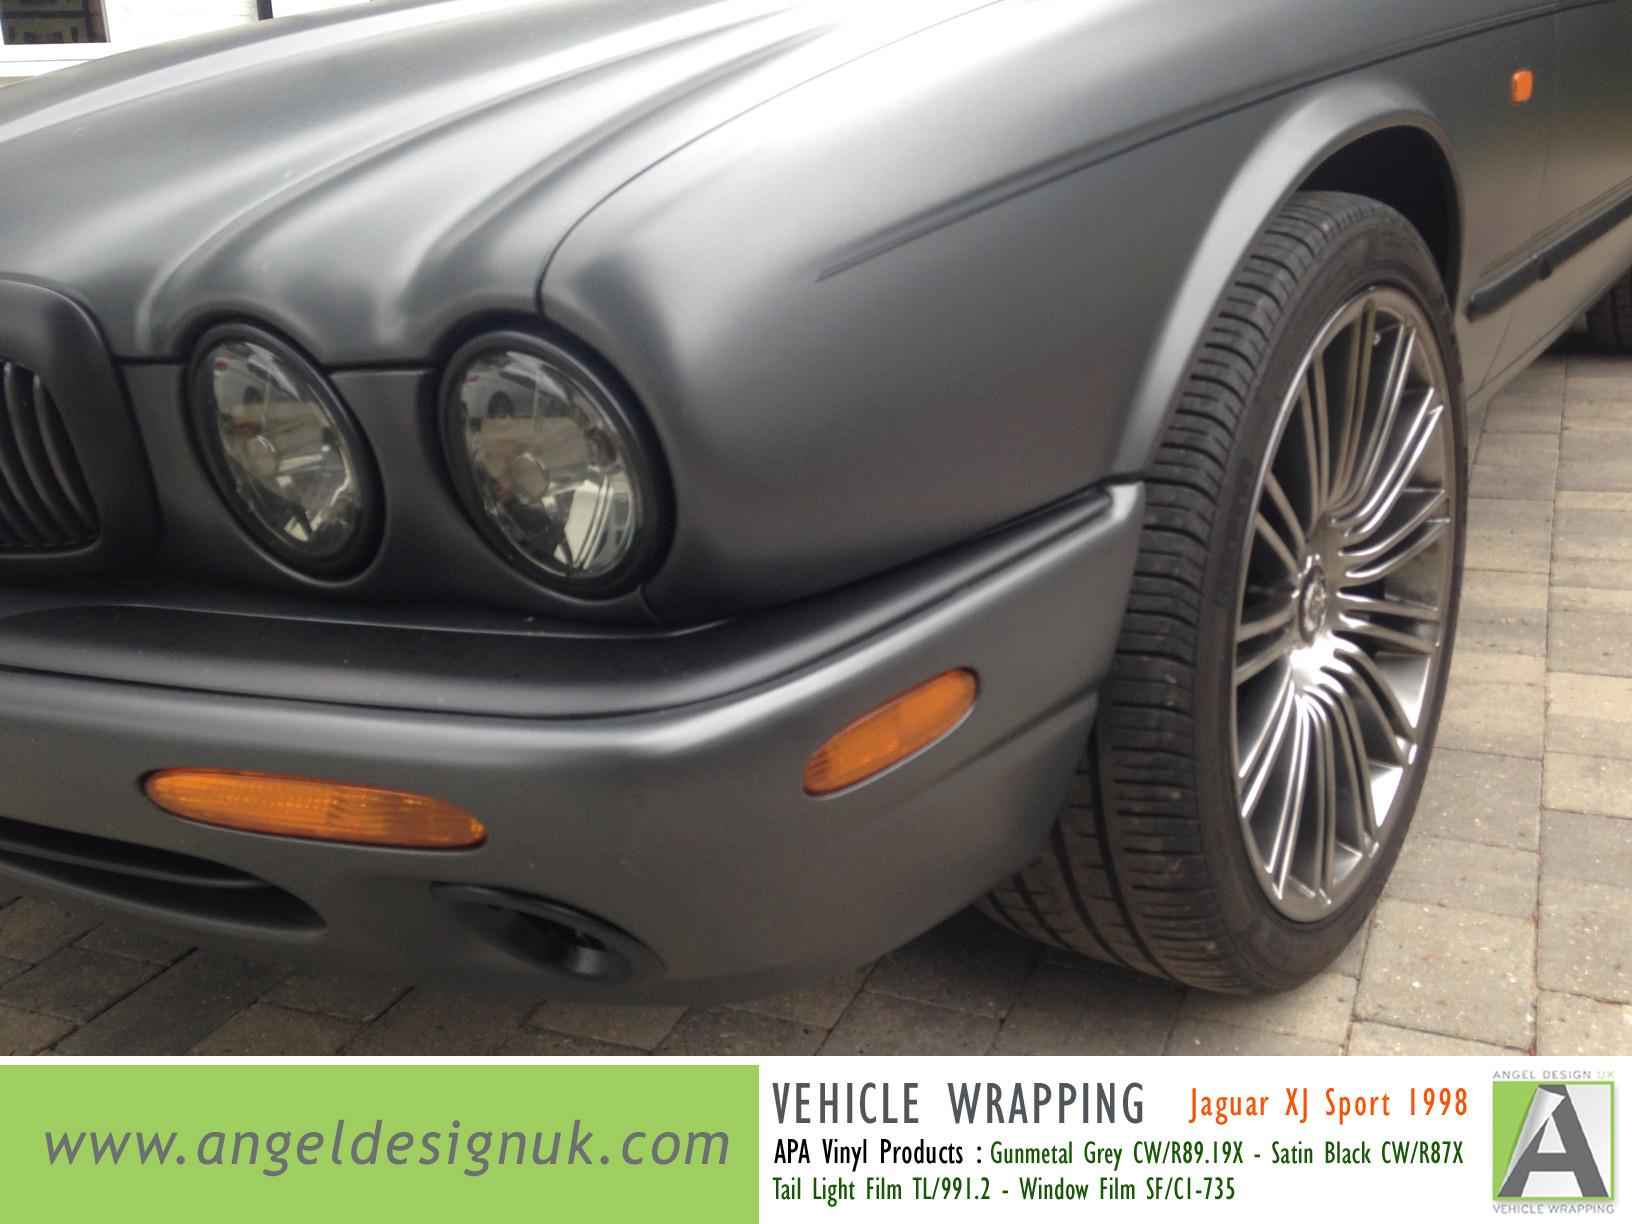 ANGEL DESIGN UK Vehicle Wrapping Jaguar XJ Sport 1998 Gunmetal Grey Pic 5